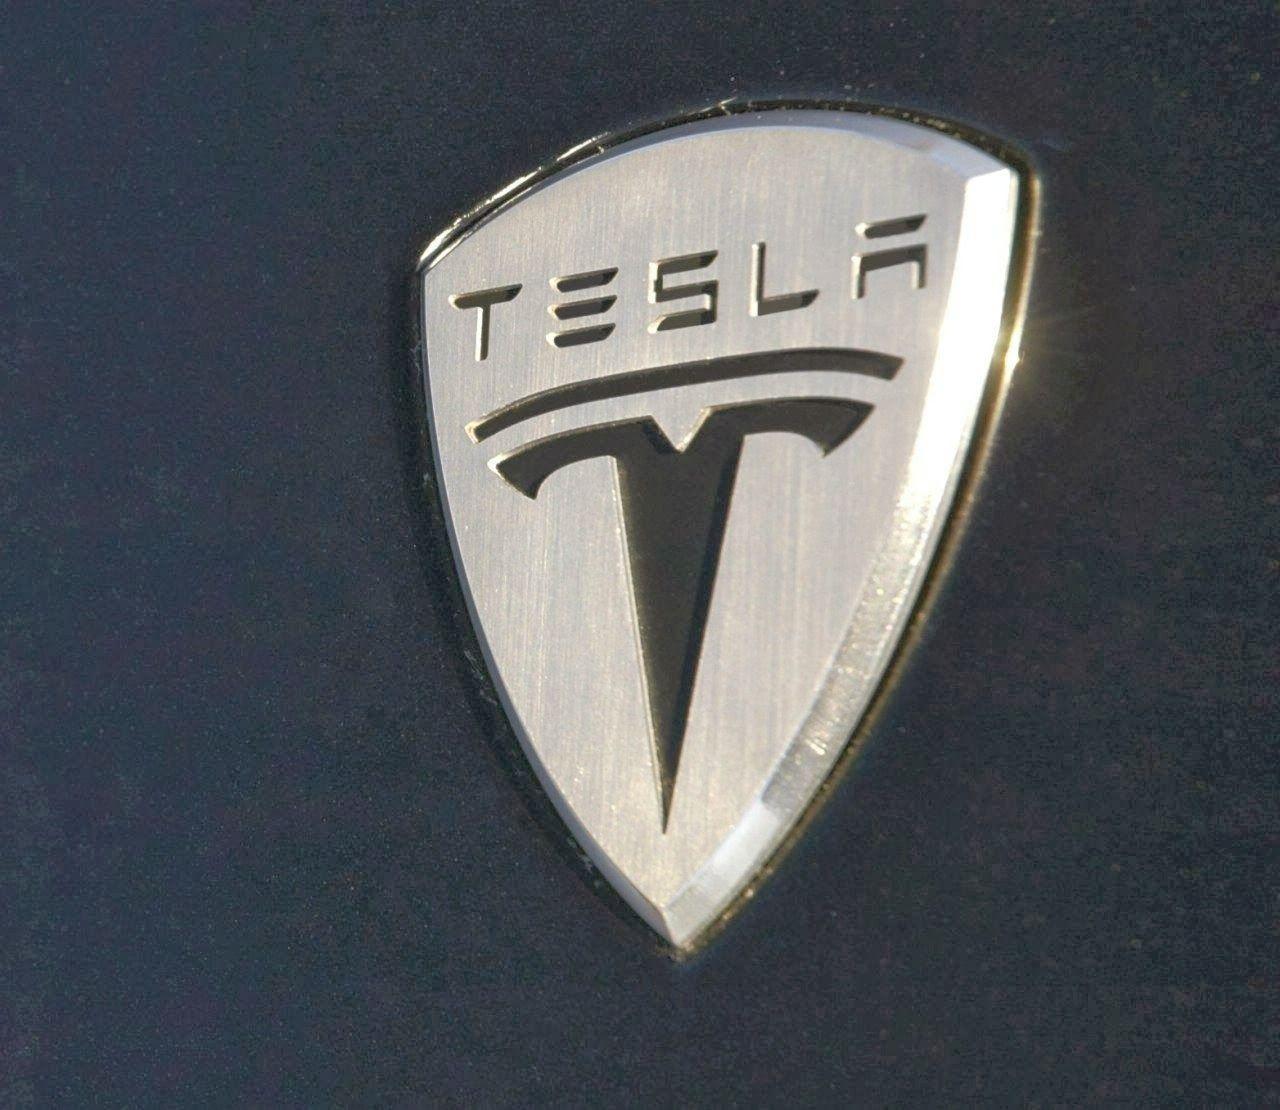 Nikola Tesla Wallpaper Hd: 19 Best Free Tesla Logo HD IPhone Wallpapers